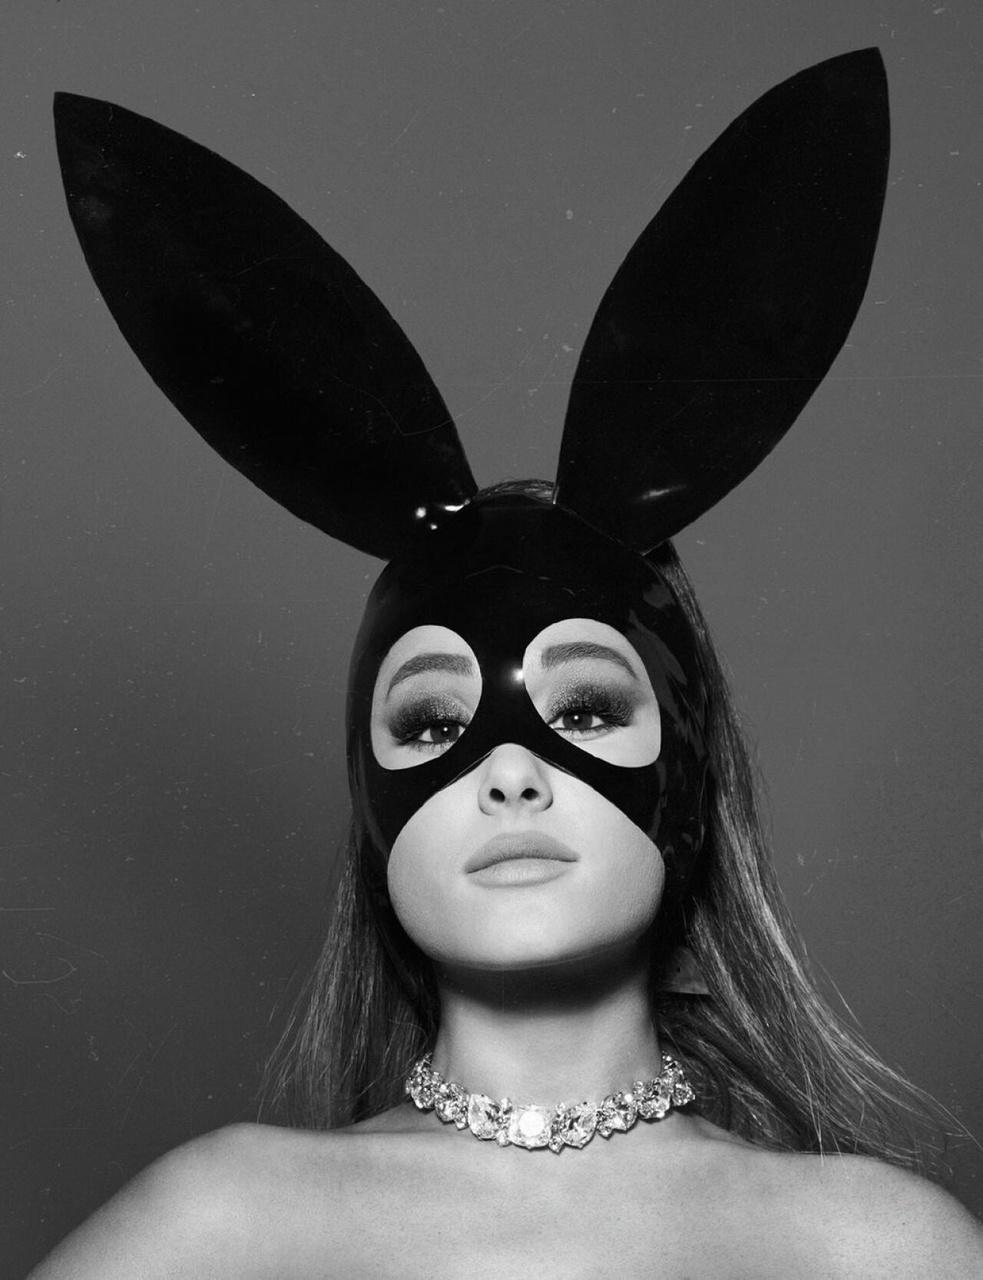 Ariana Grande, Dangerous Woman, And Ariana Image - Ariana Grande Dangerous Woman Era , HD Wallpaper & Backgrounds